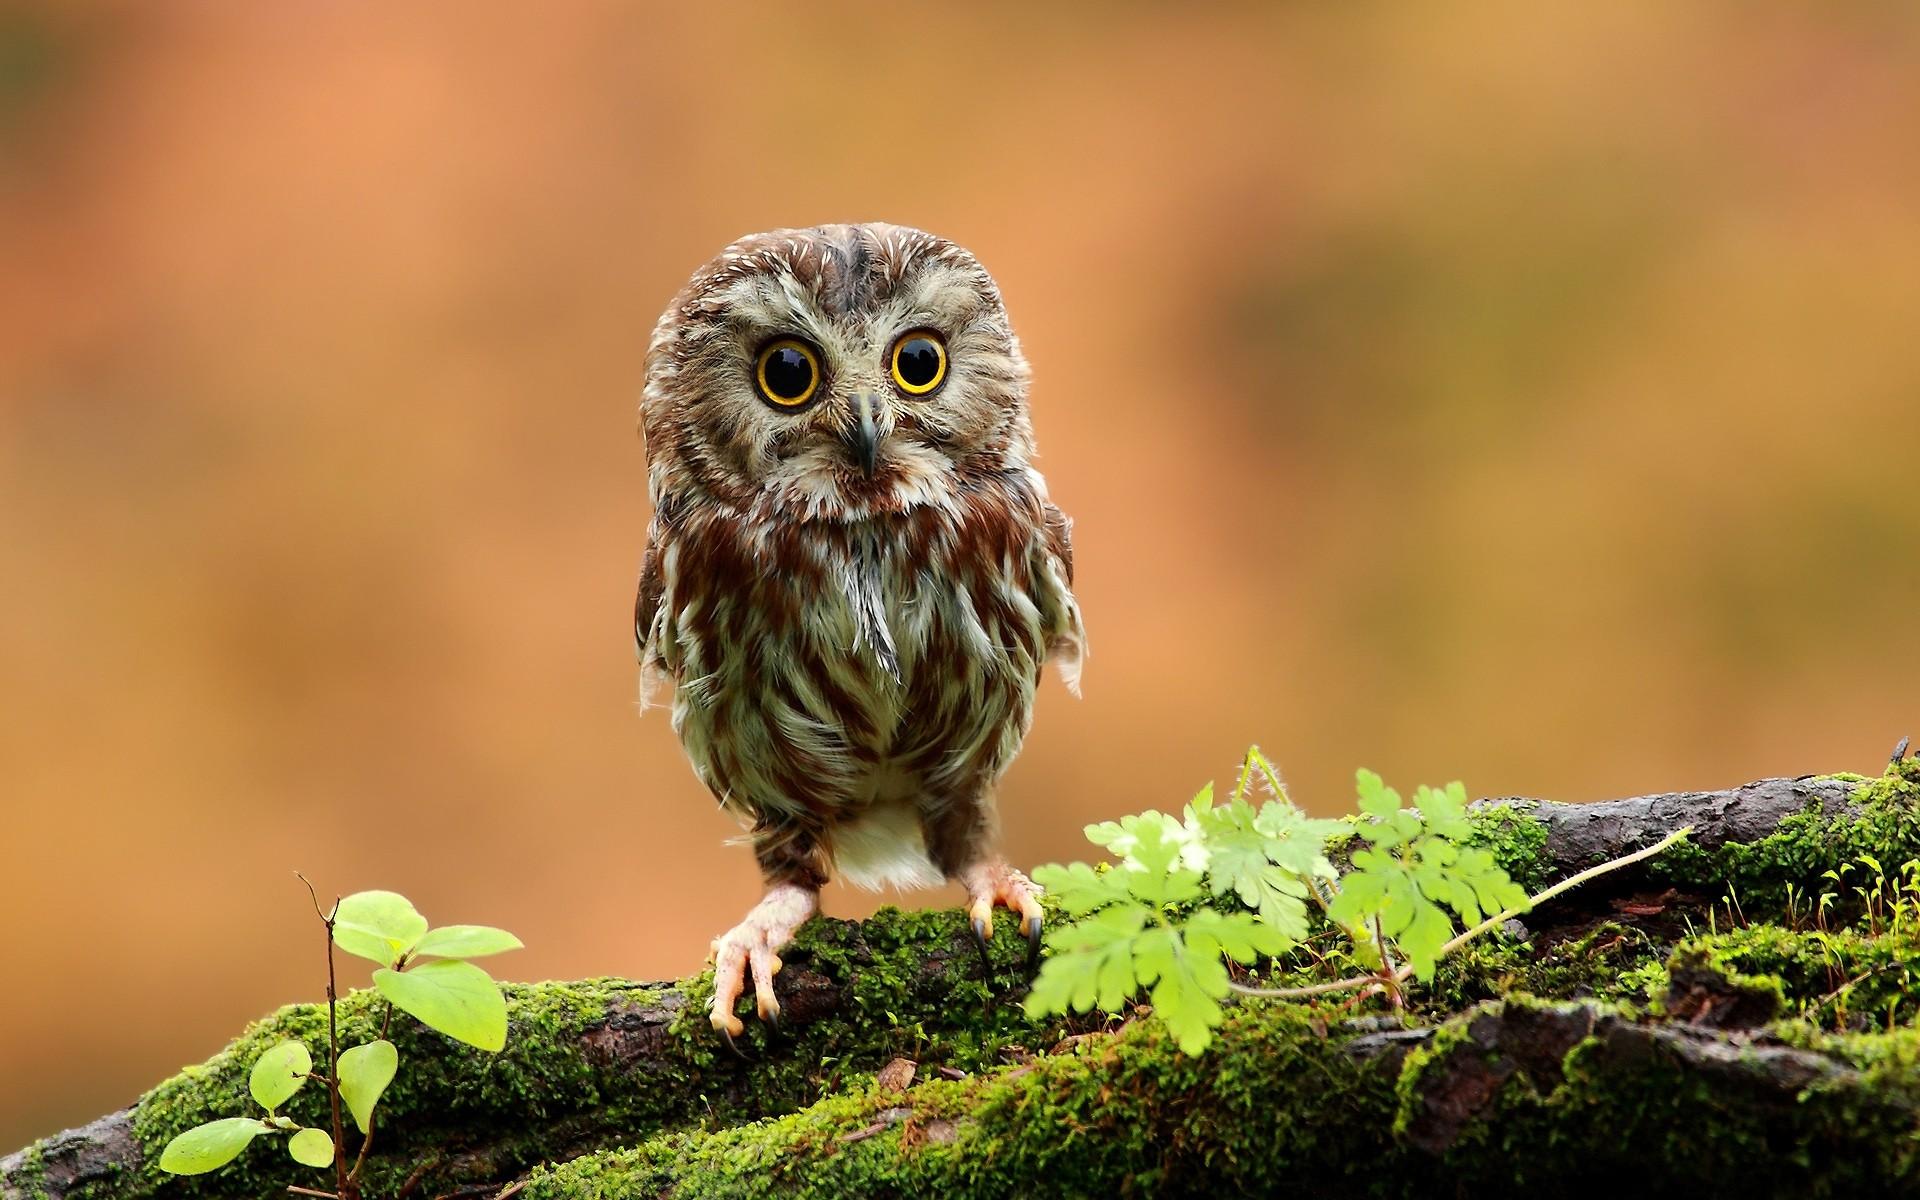 Res: 1920x1200, Baby Owl Wallpaper Cute Wallpaper